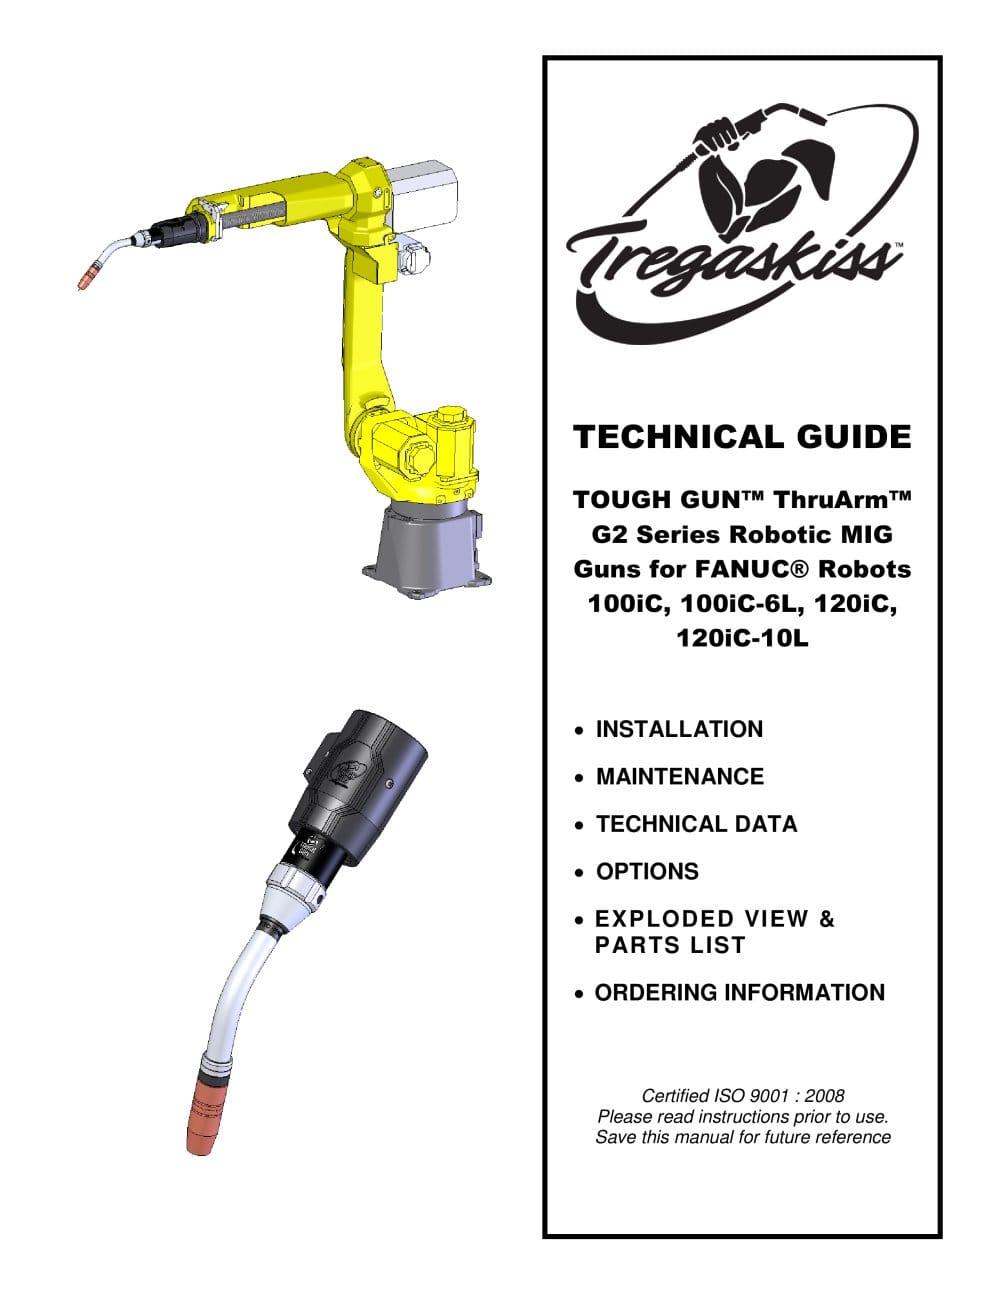 TOUGH GUN ThruArm G2 Series MIG Guns for FANUC Robots Owner's Manual - 1 /  16 Pages